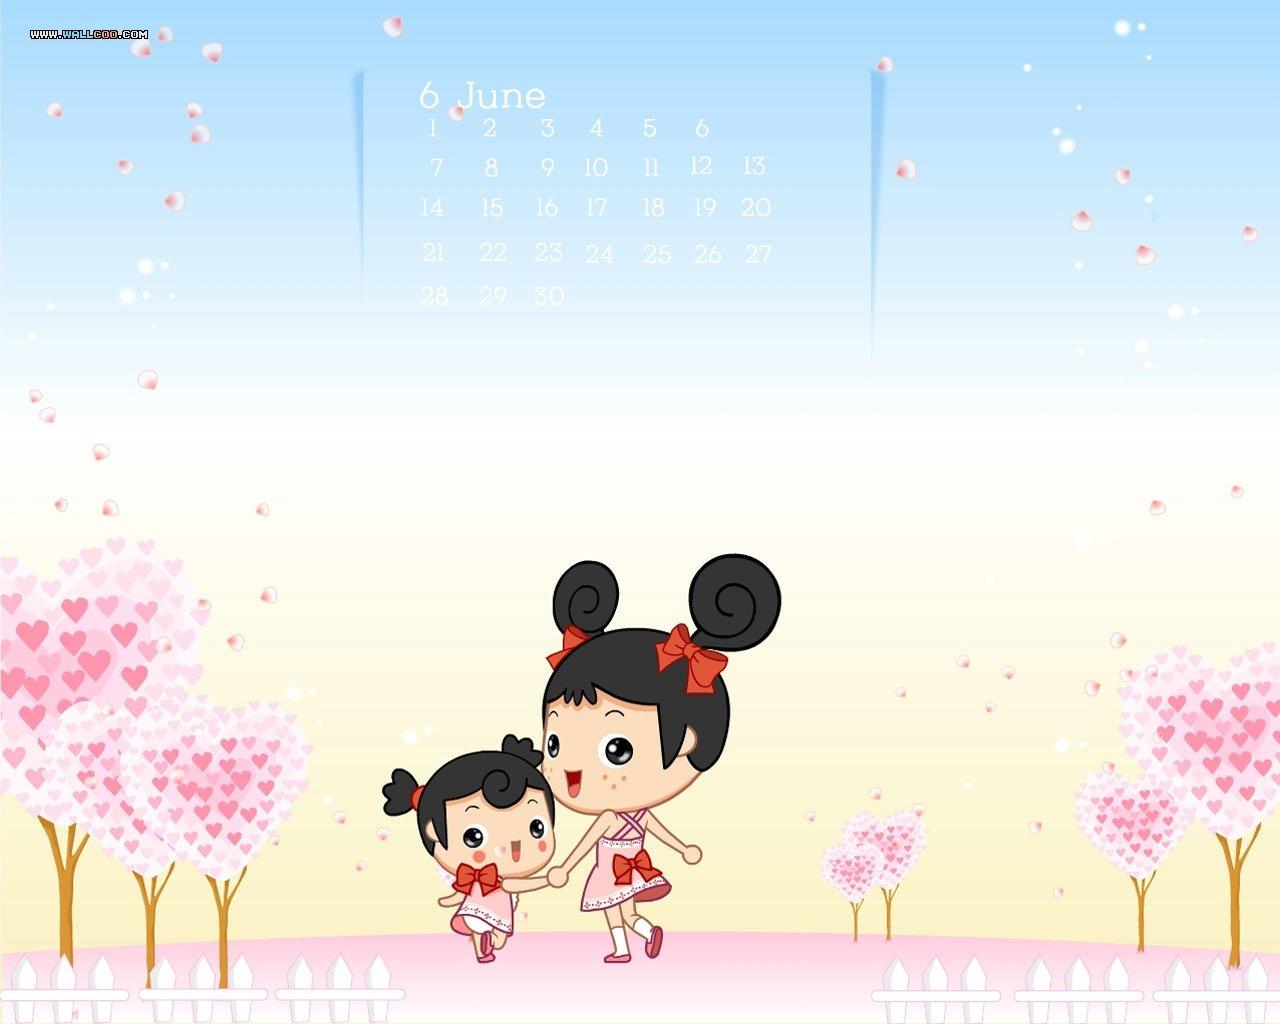 48 cute cartoon wallpapers for girls on wallpapersafari - Cartoon girl images hd ...